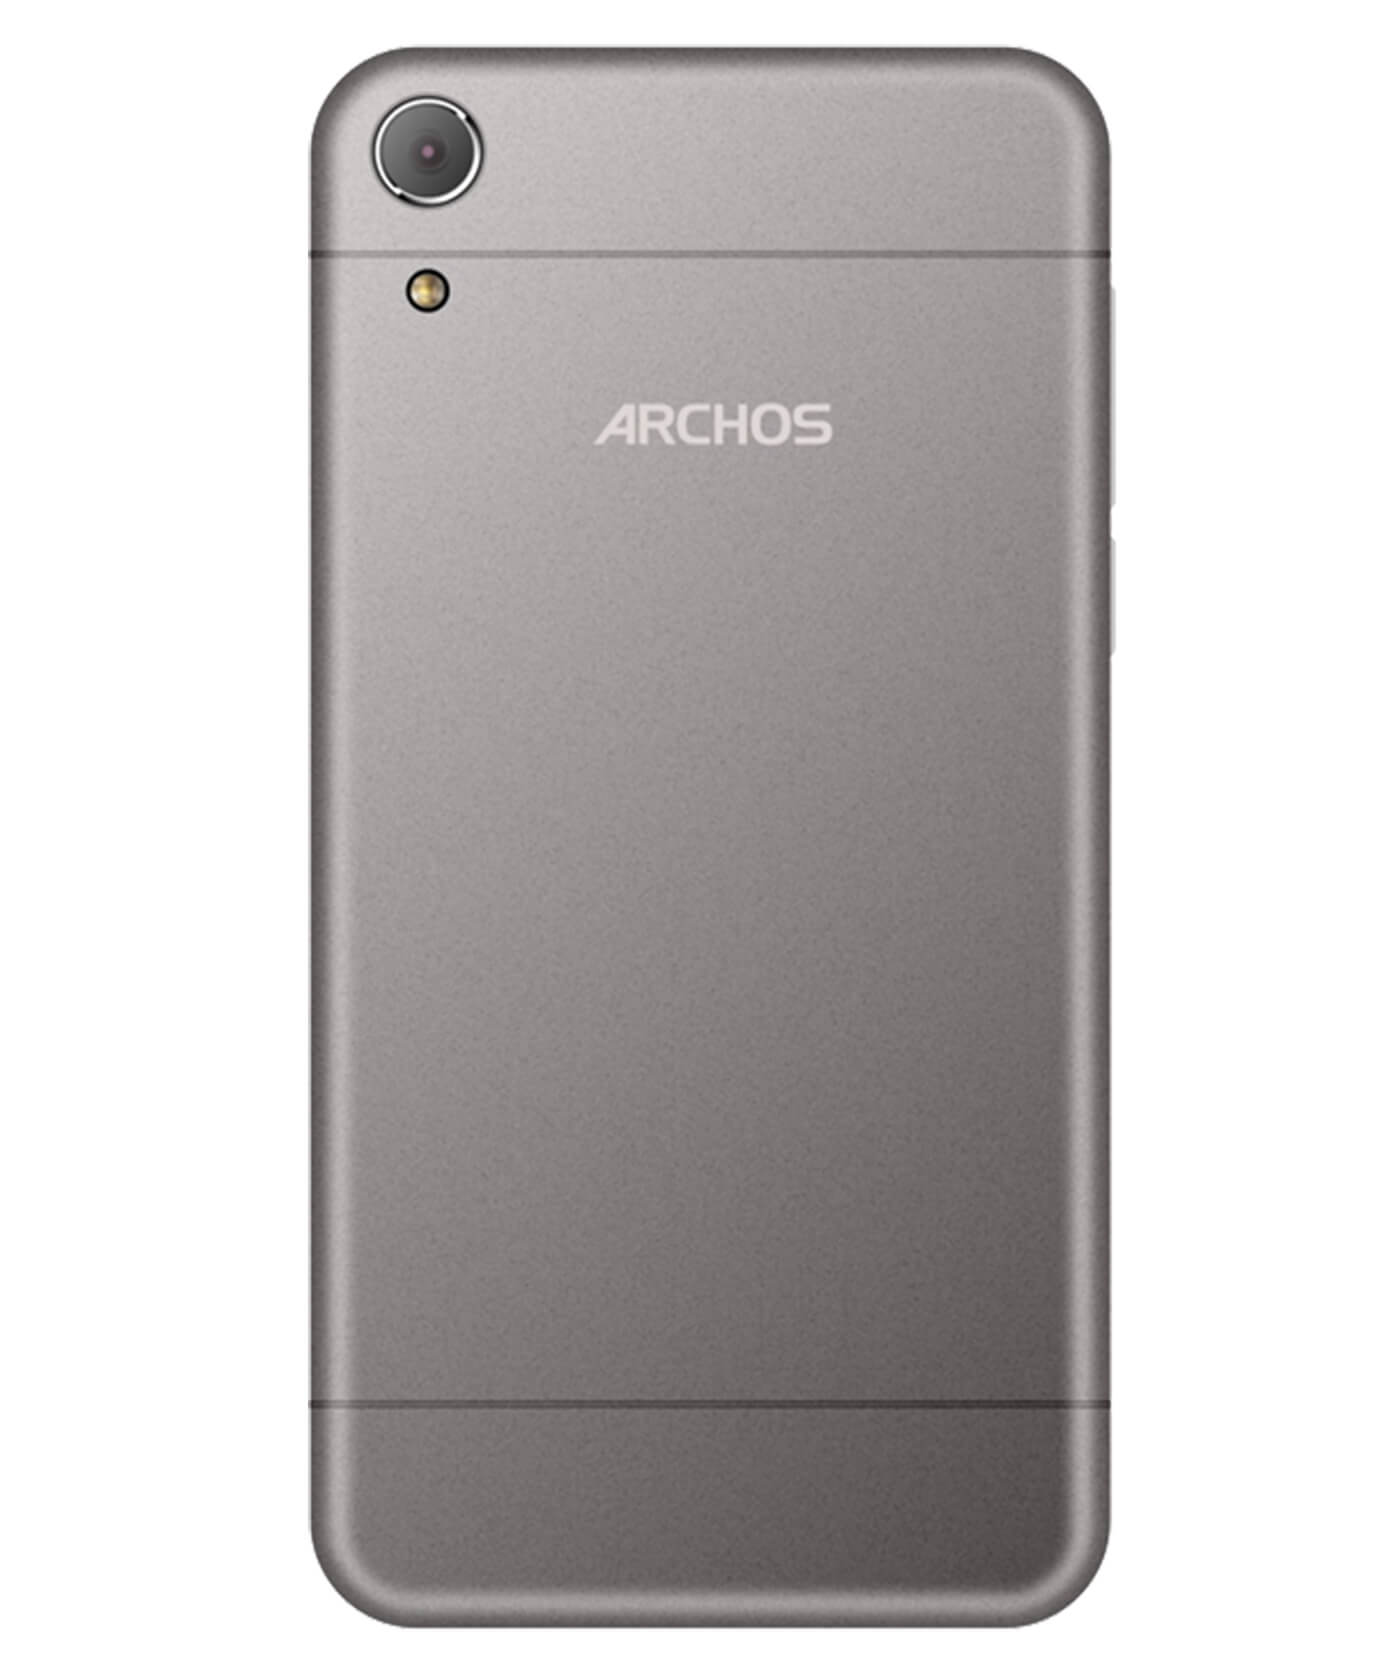 Archos Oxygen Plus camera